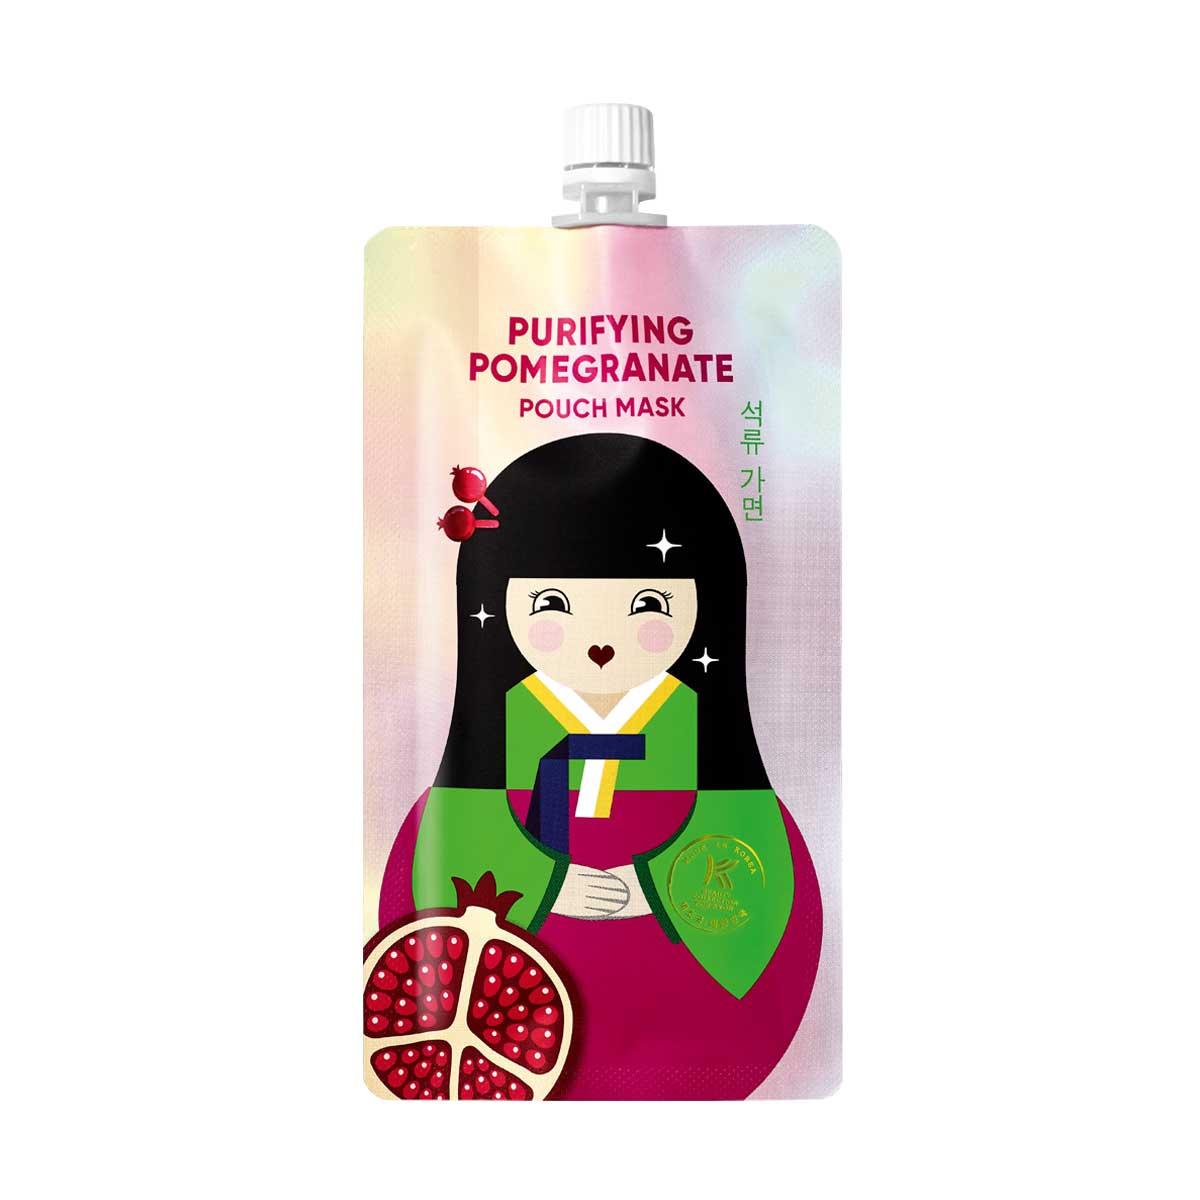 Korean Beauty Purifying Pomegranate Pouch Mask 1318229 10ml